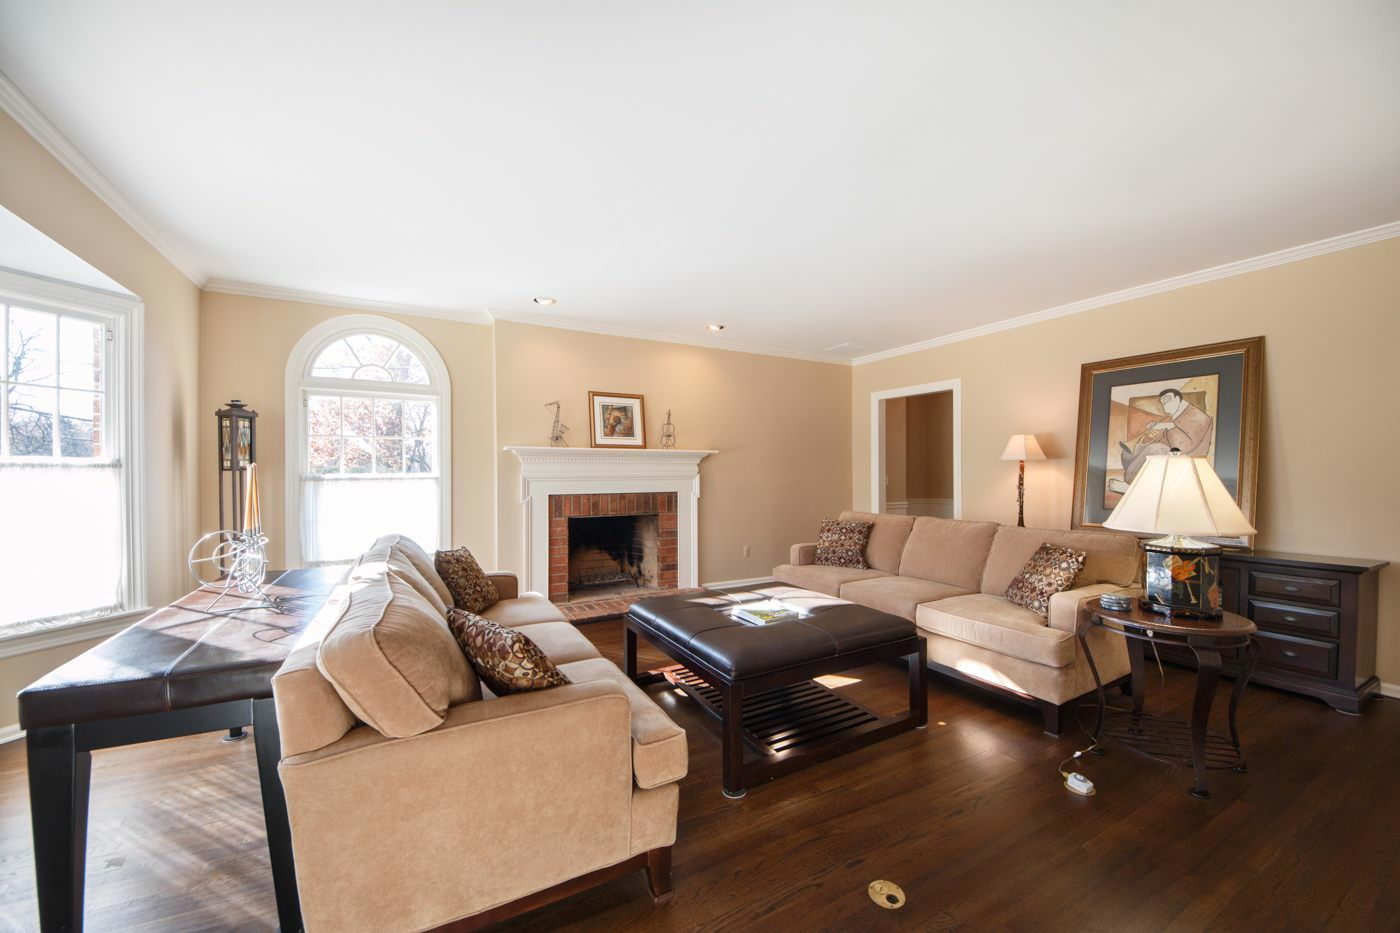 New England Bedroom 50 New England Ave Unit A Summit Nj 07901 Sue Adler Realtor